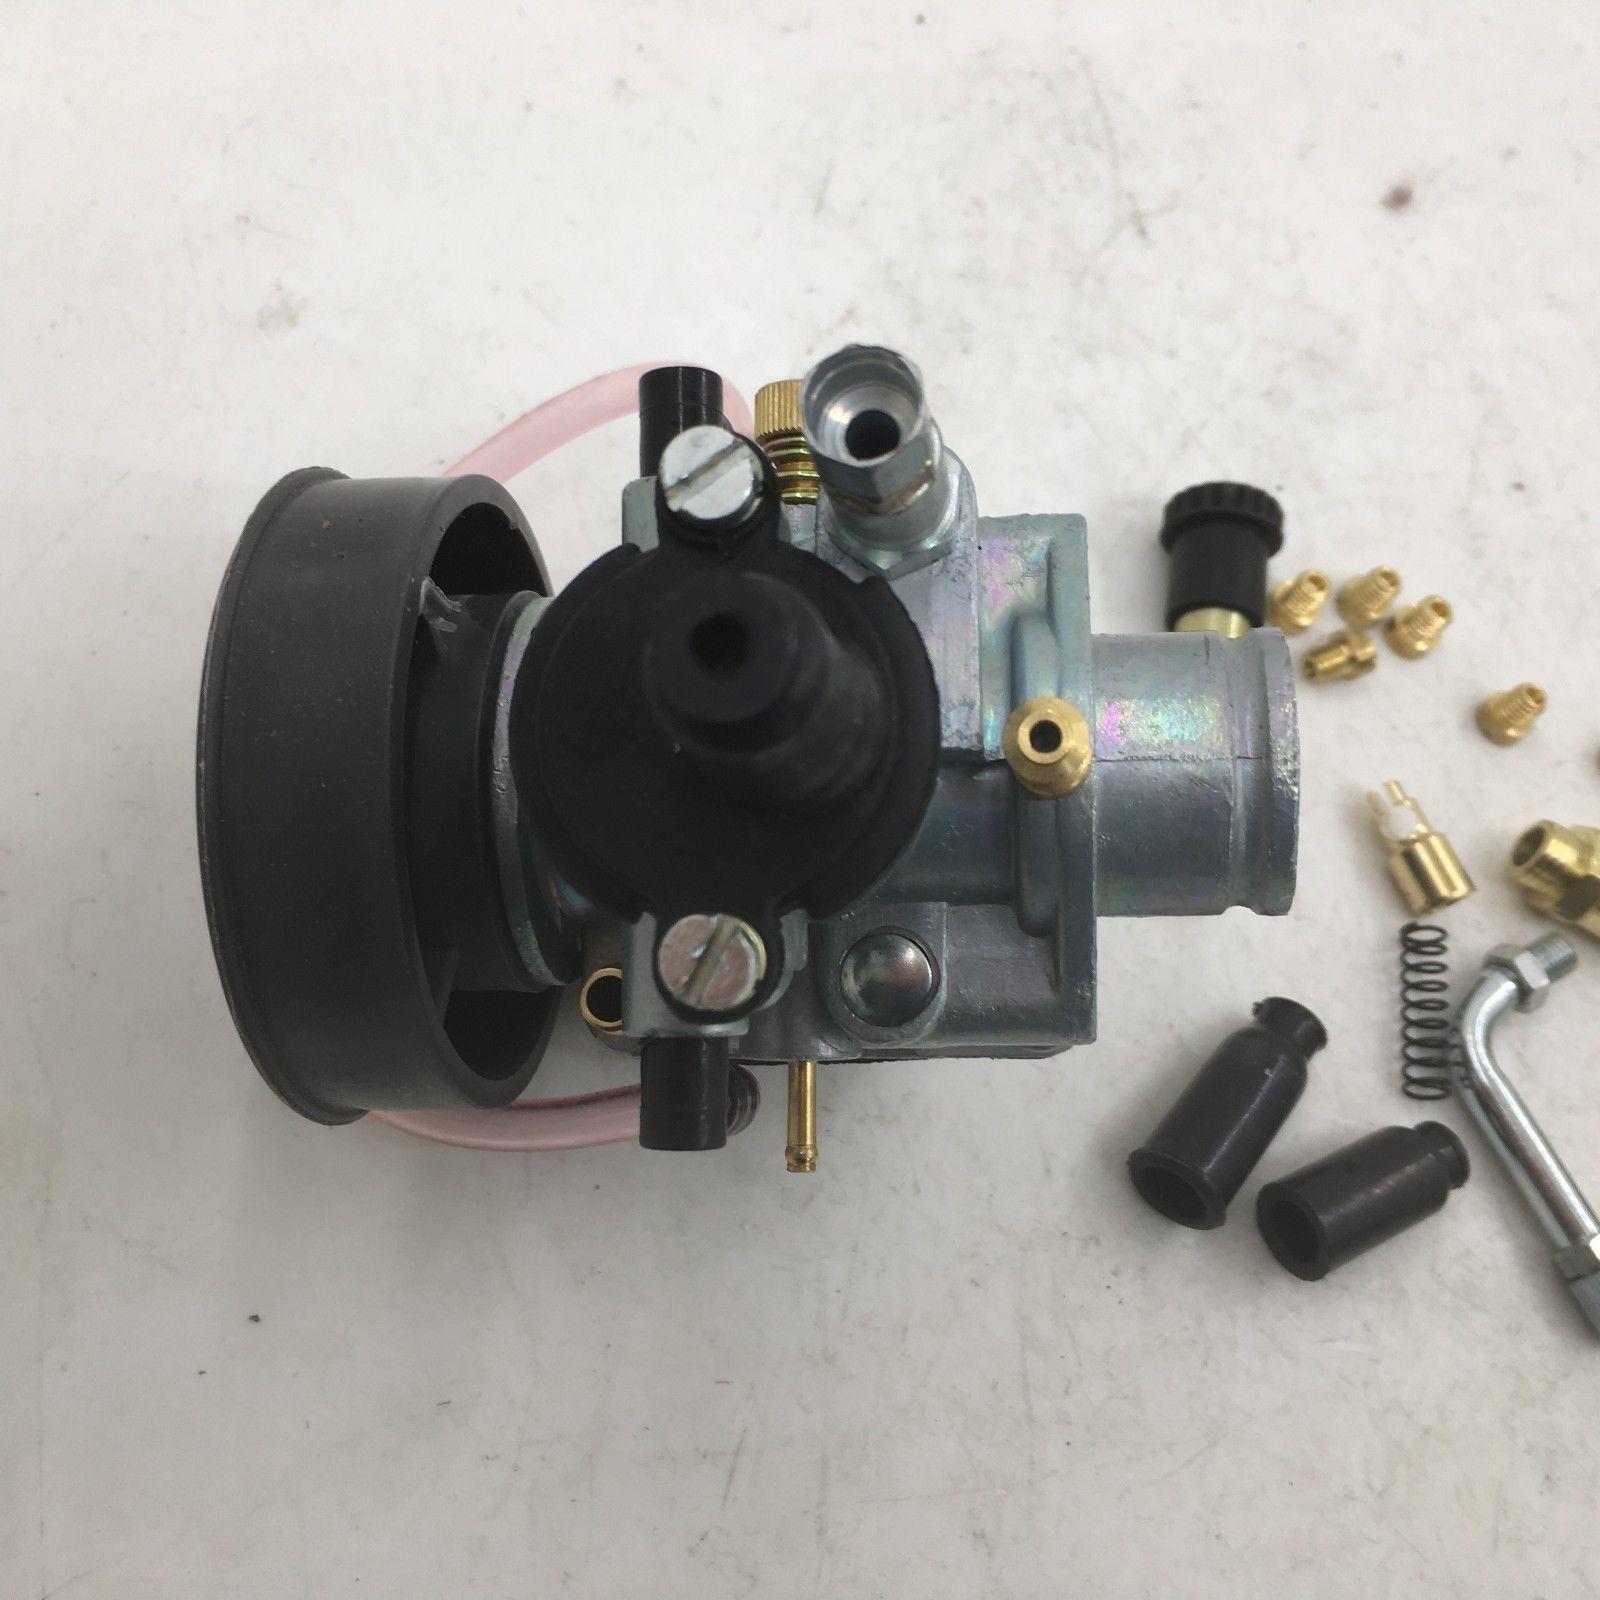 carb carburetor carburettor PHBG 19mm racing phbg19 5 dellorto Model for  YAMAHA